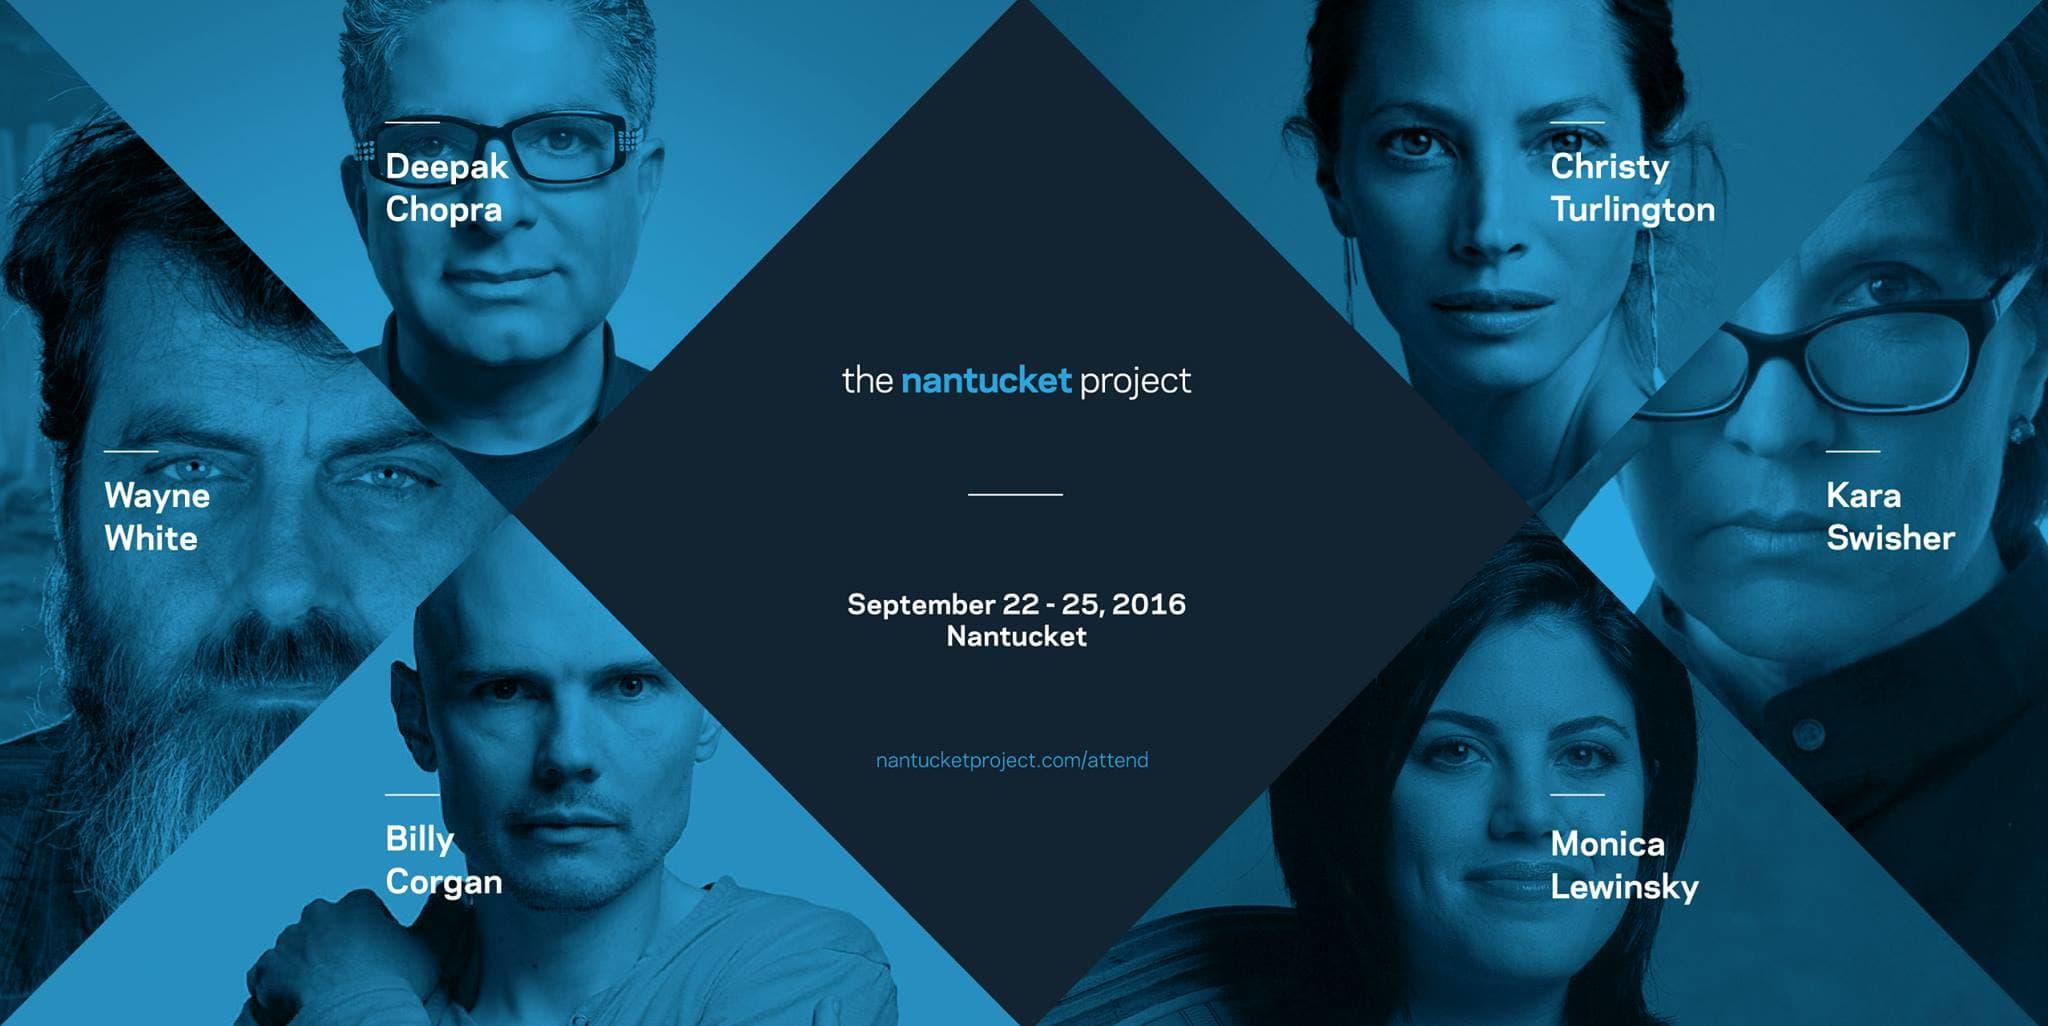 nantucket project presenters